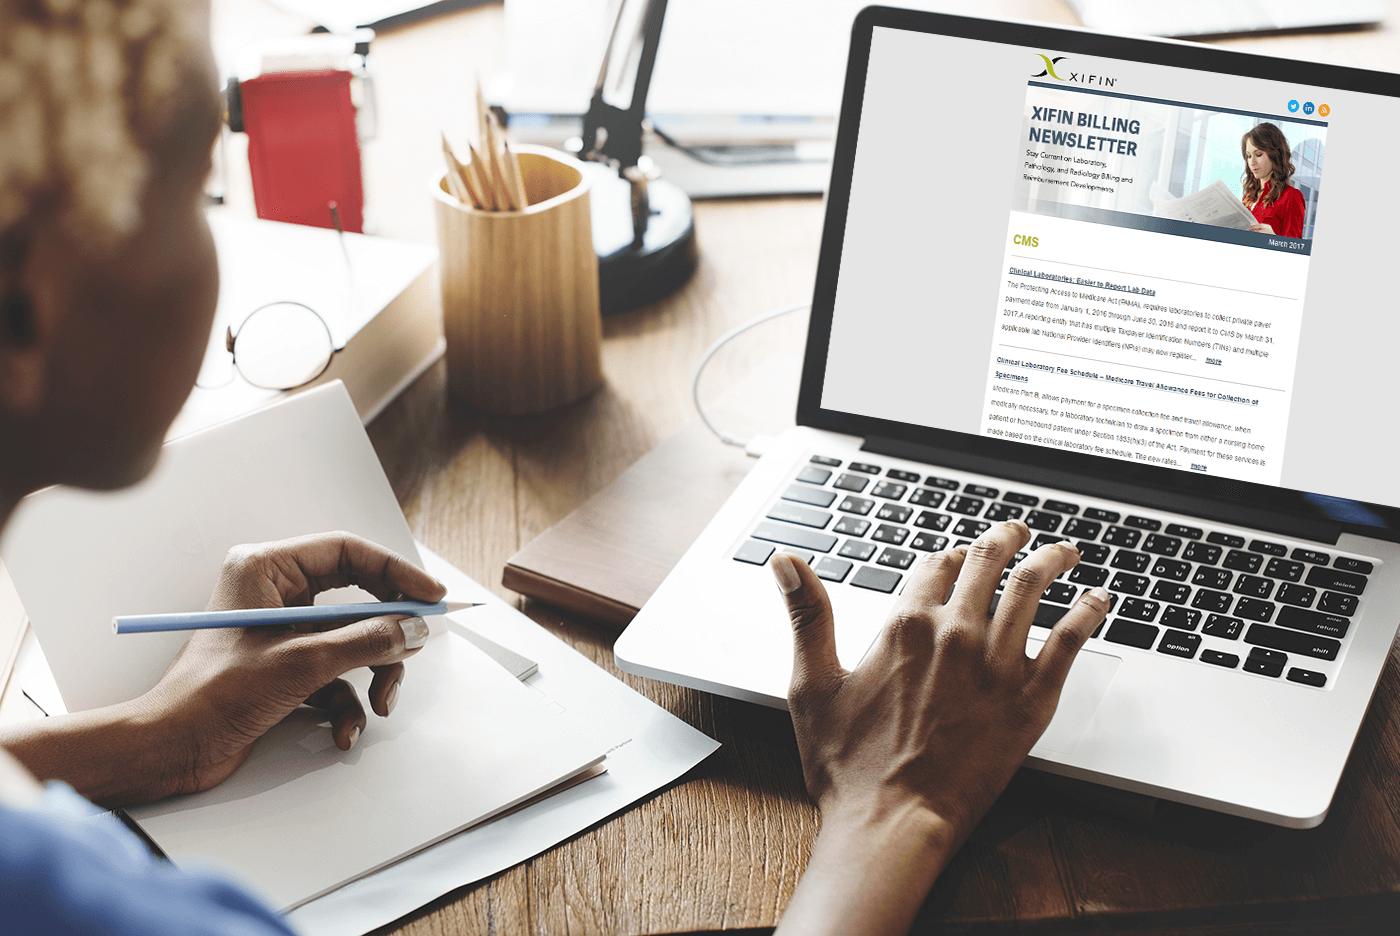 XIFIN Billing Newsletter